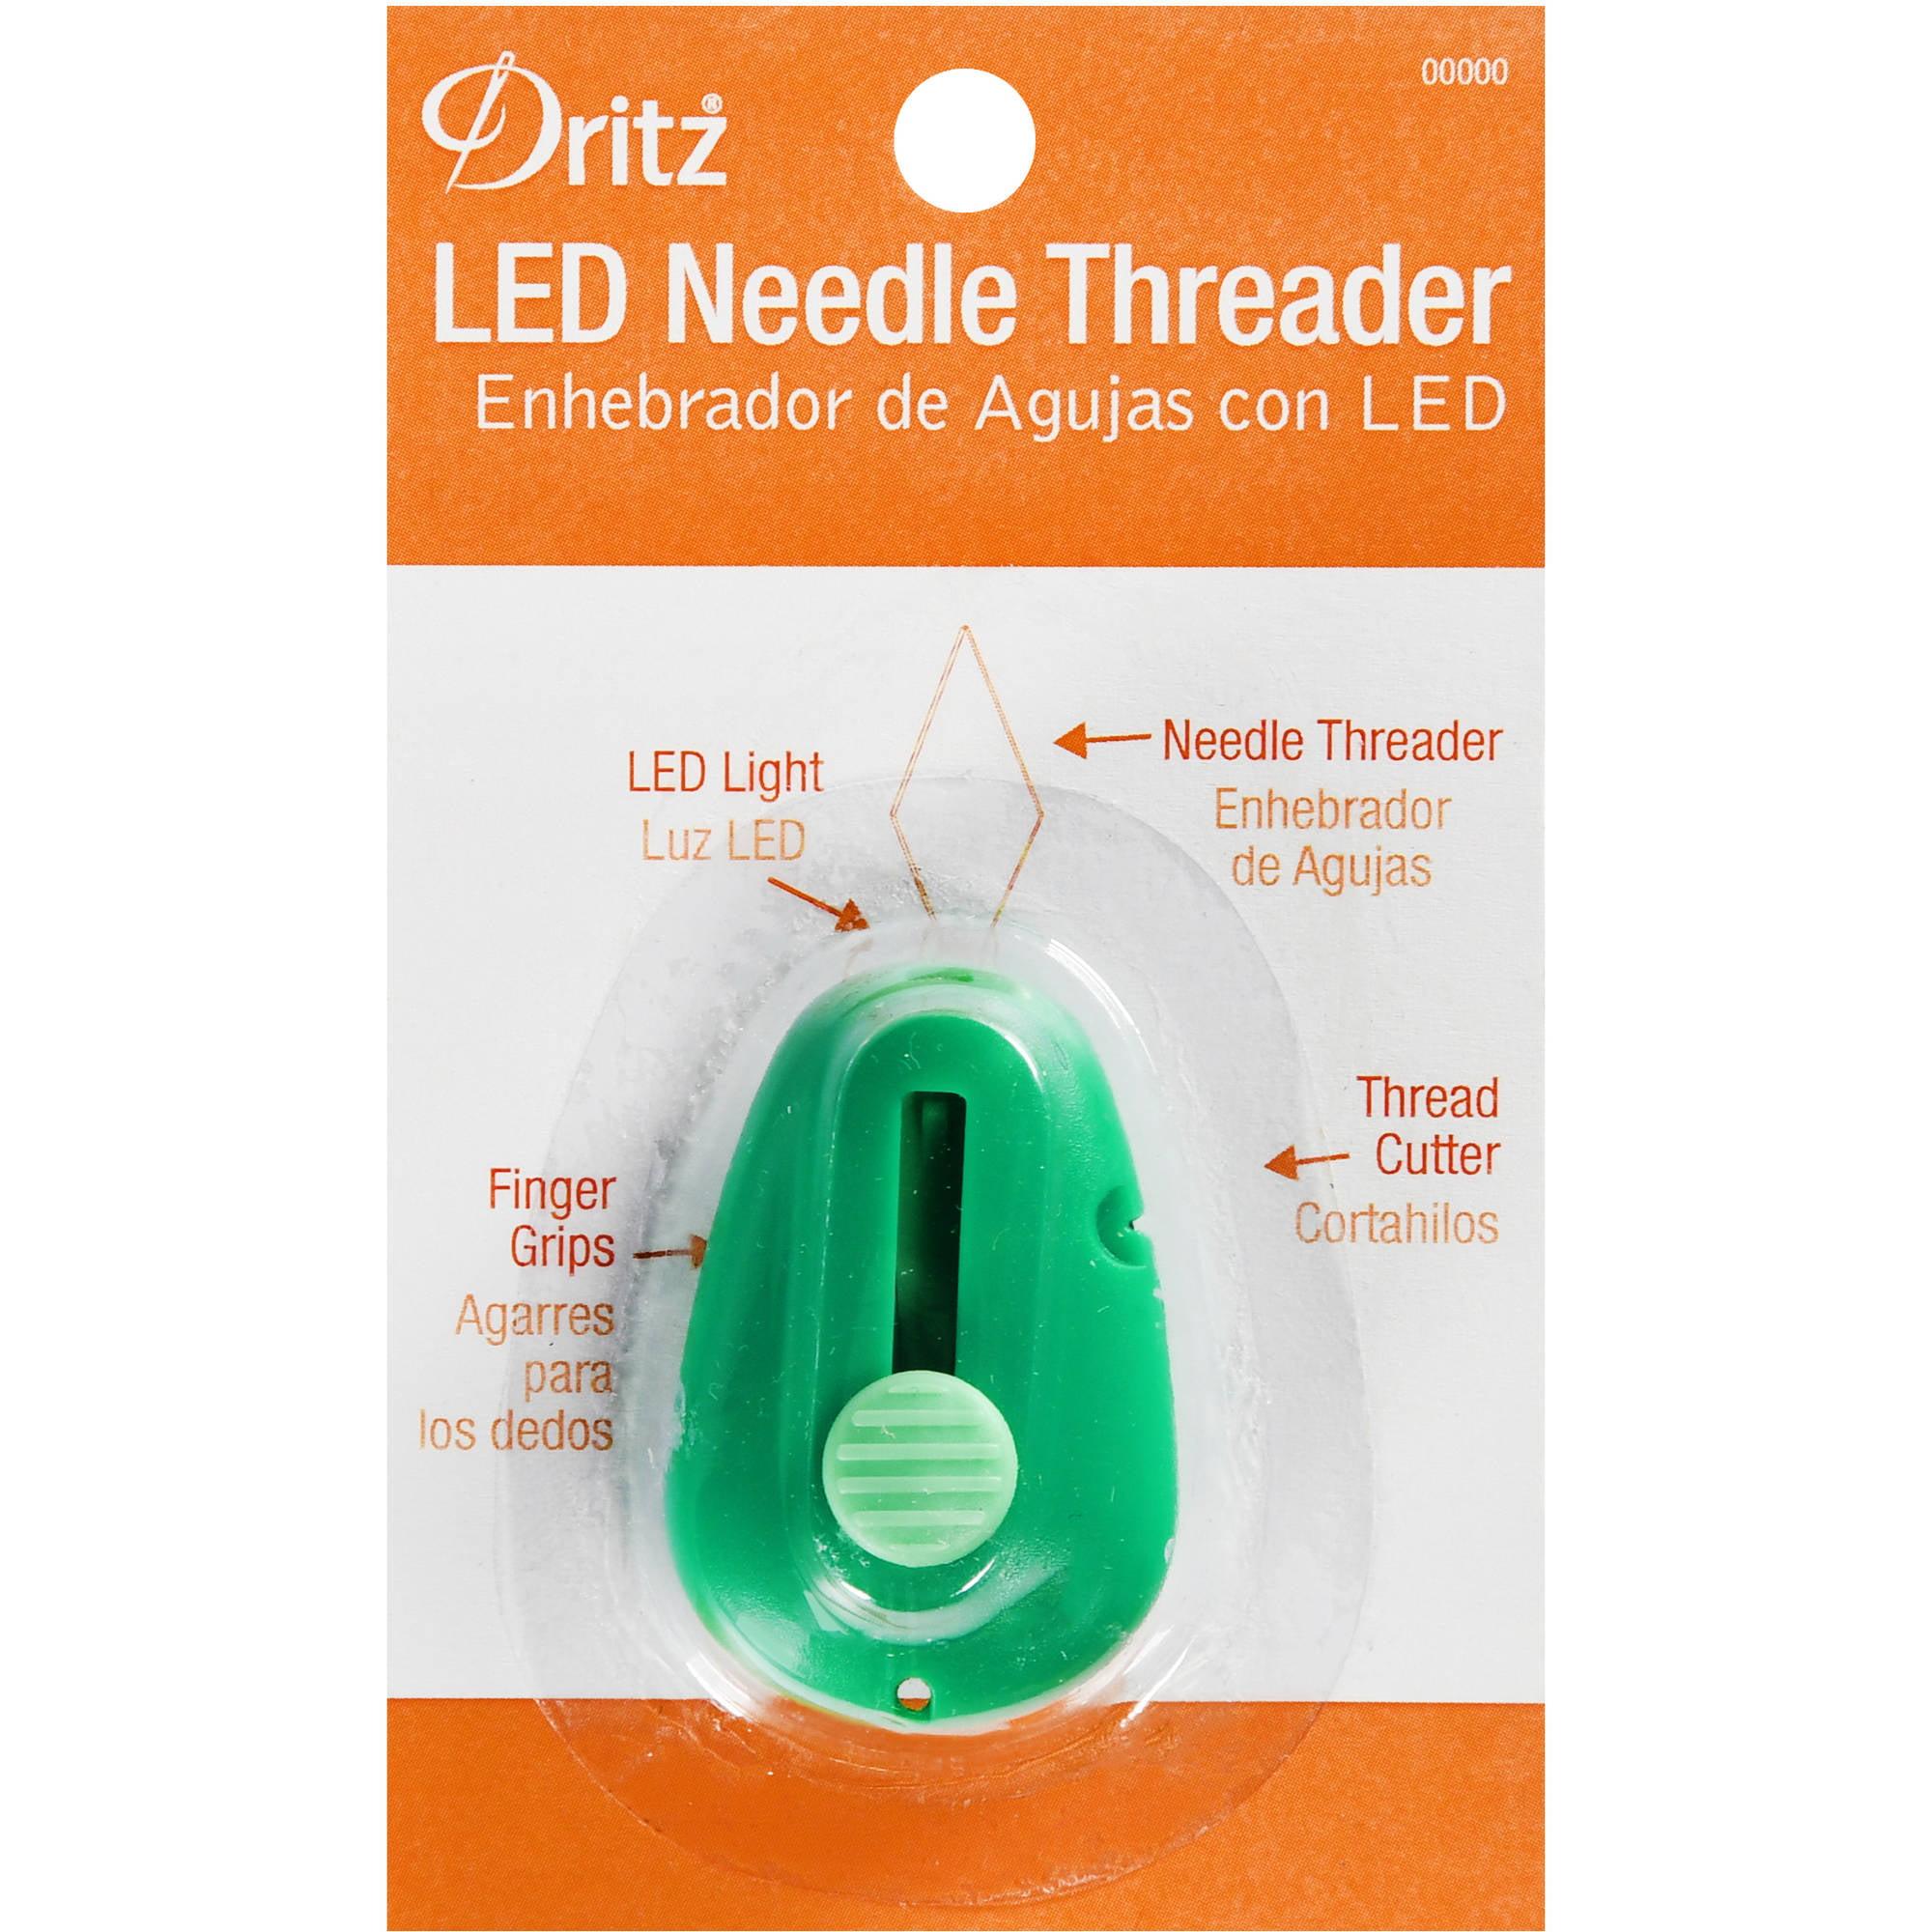 Dritz Led Needle Threader